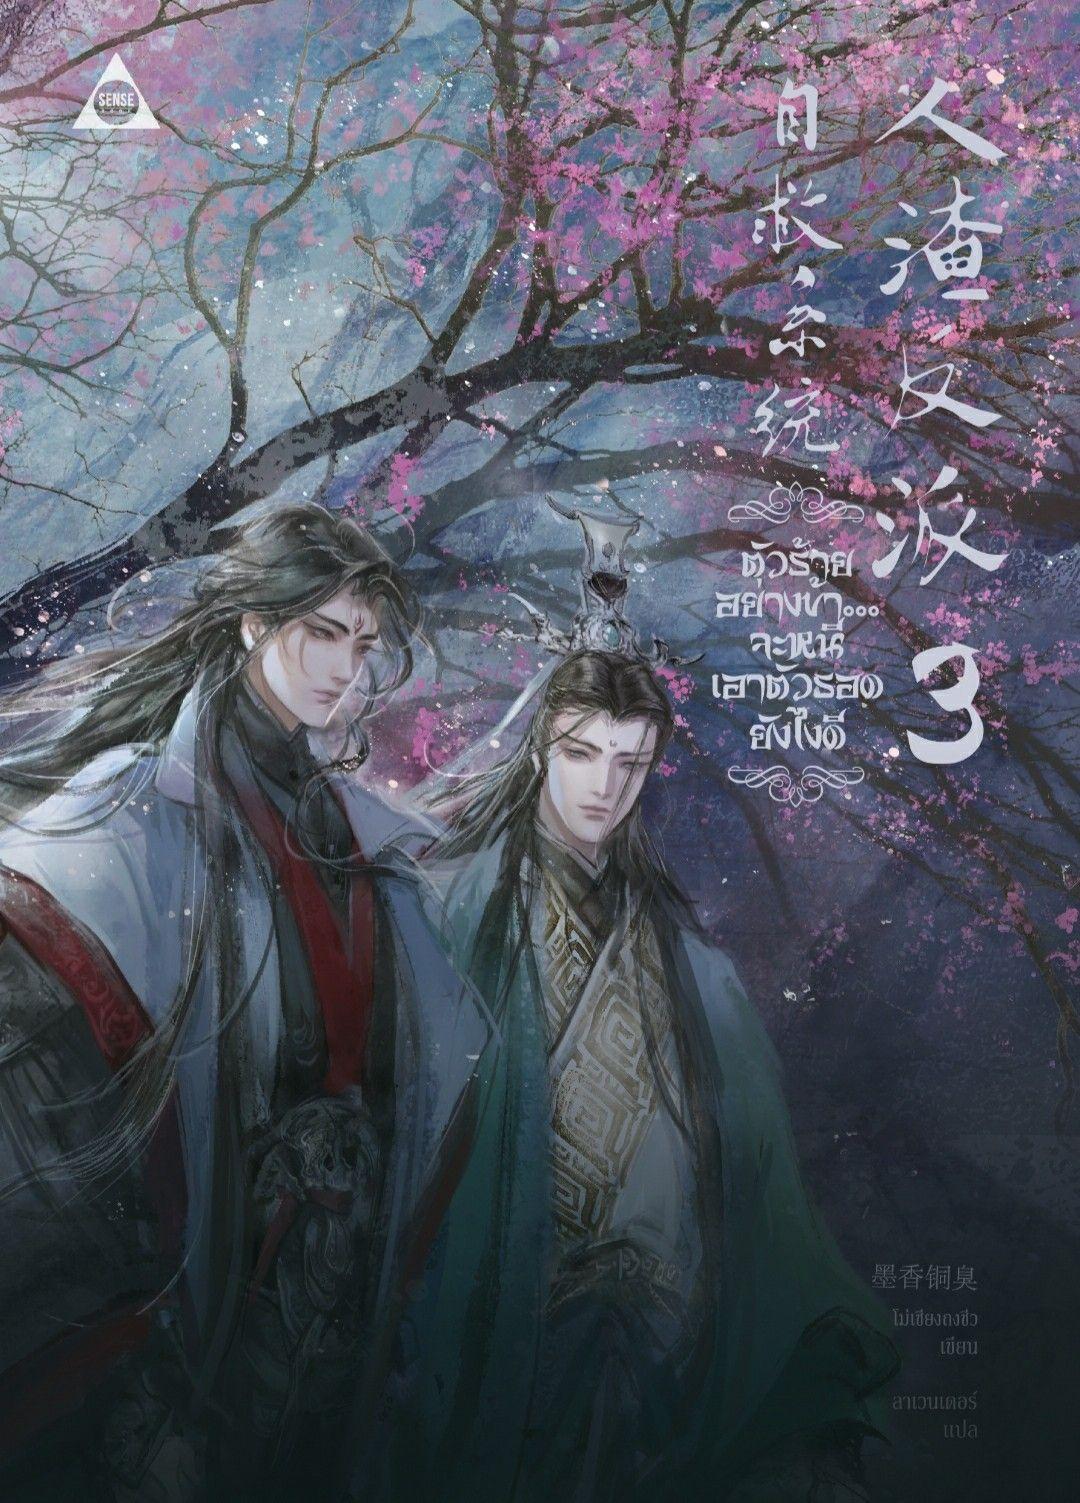 pin by dianxia is cute on scum villain s self saving system 人渣反派自救系统 villain anime cover art